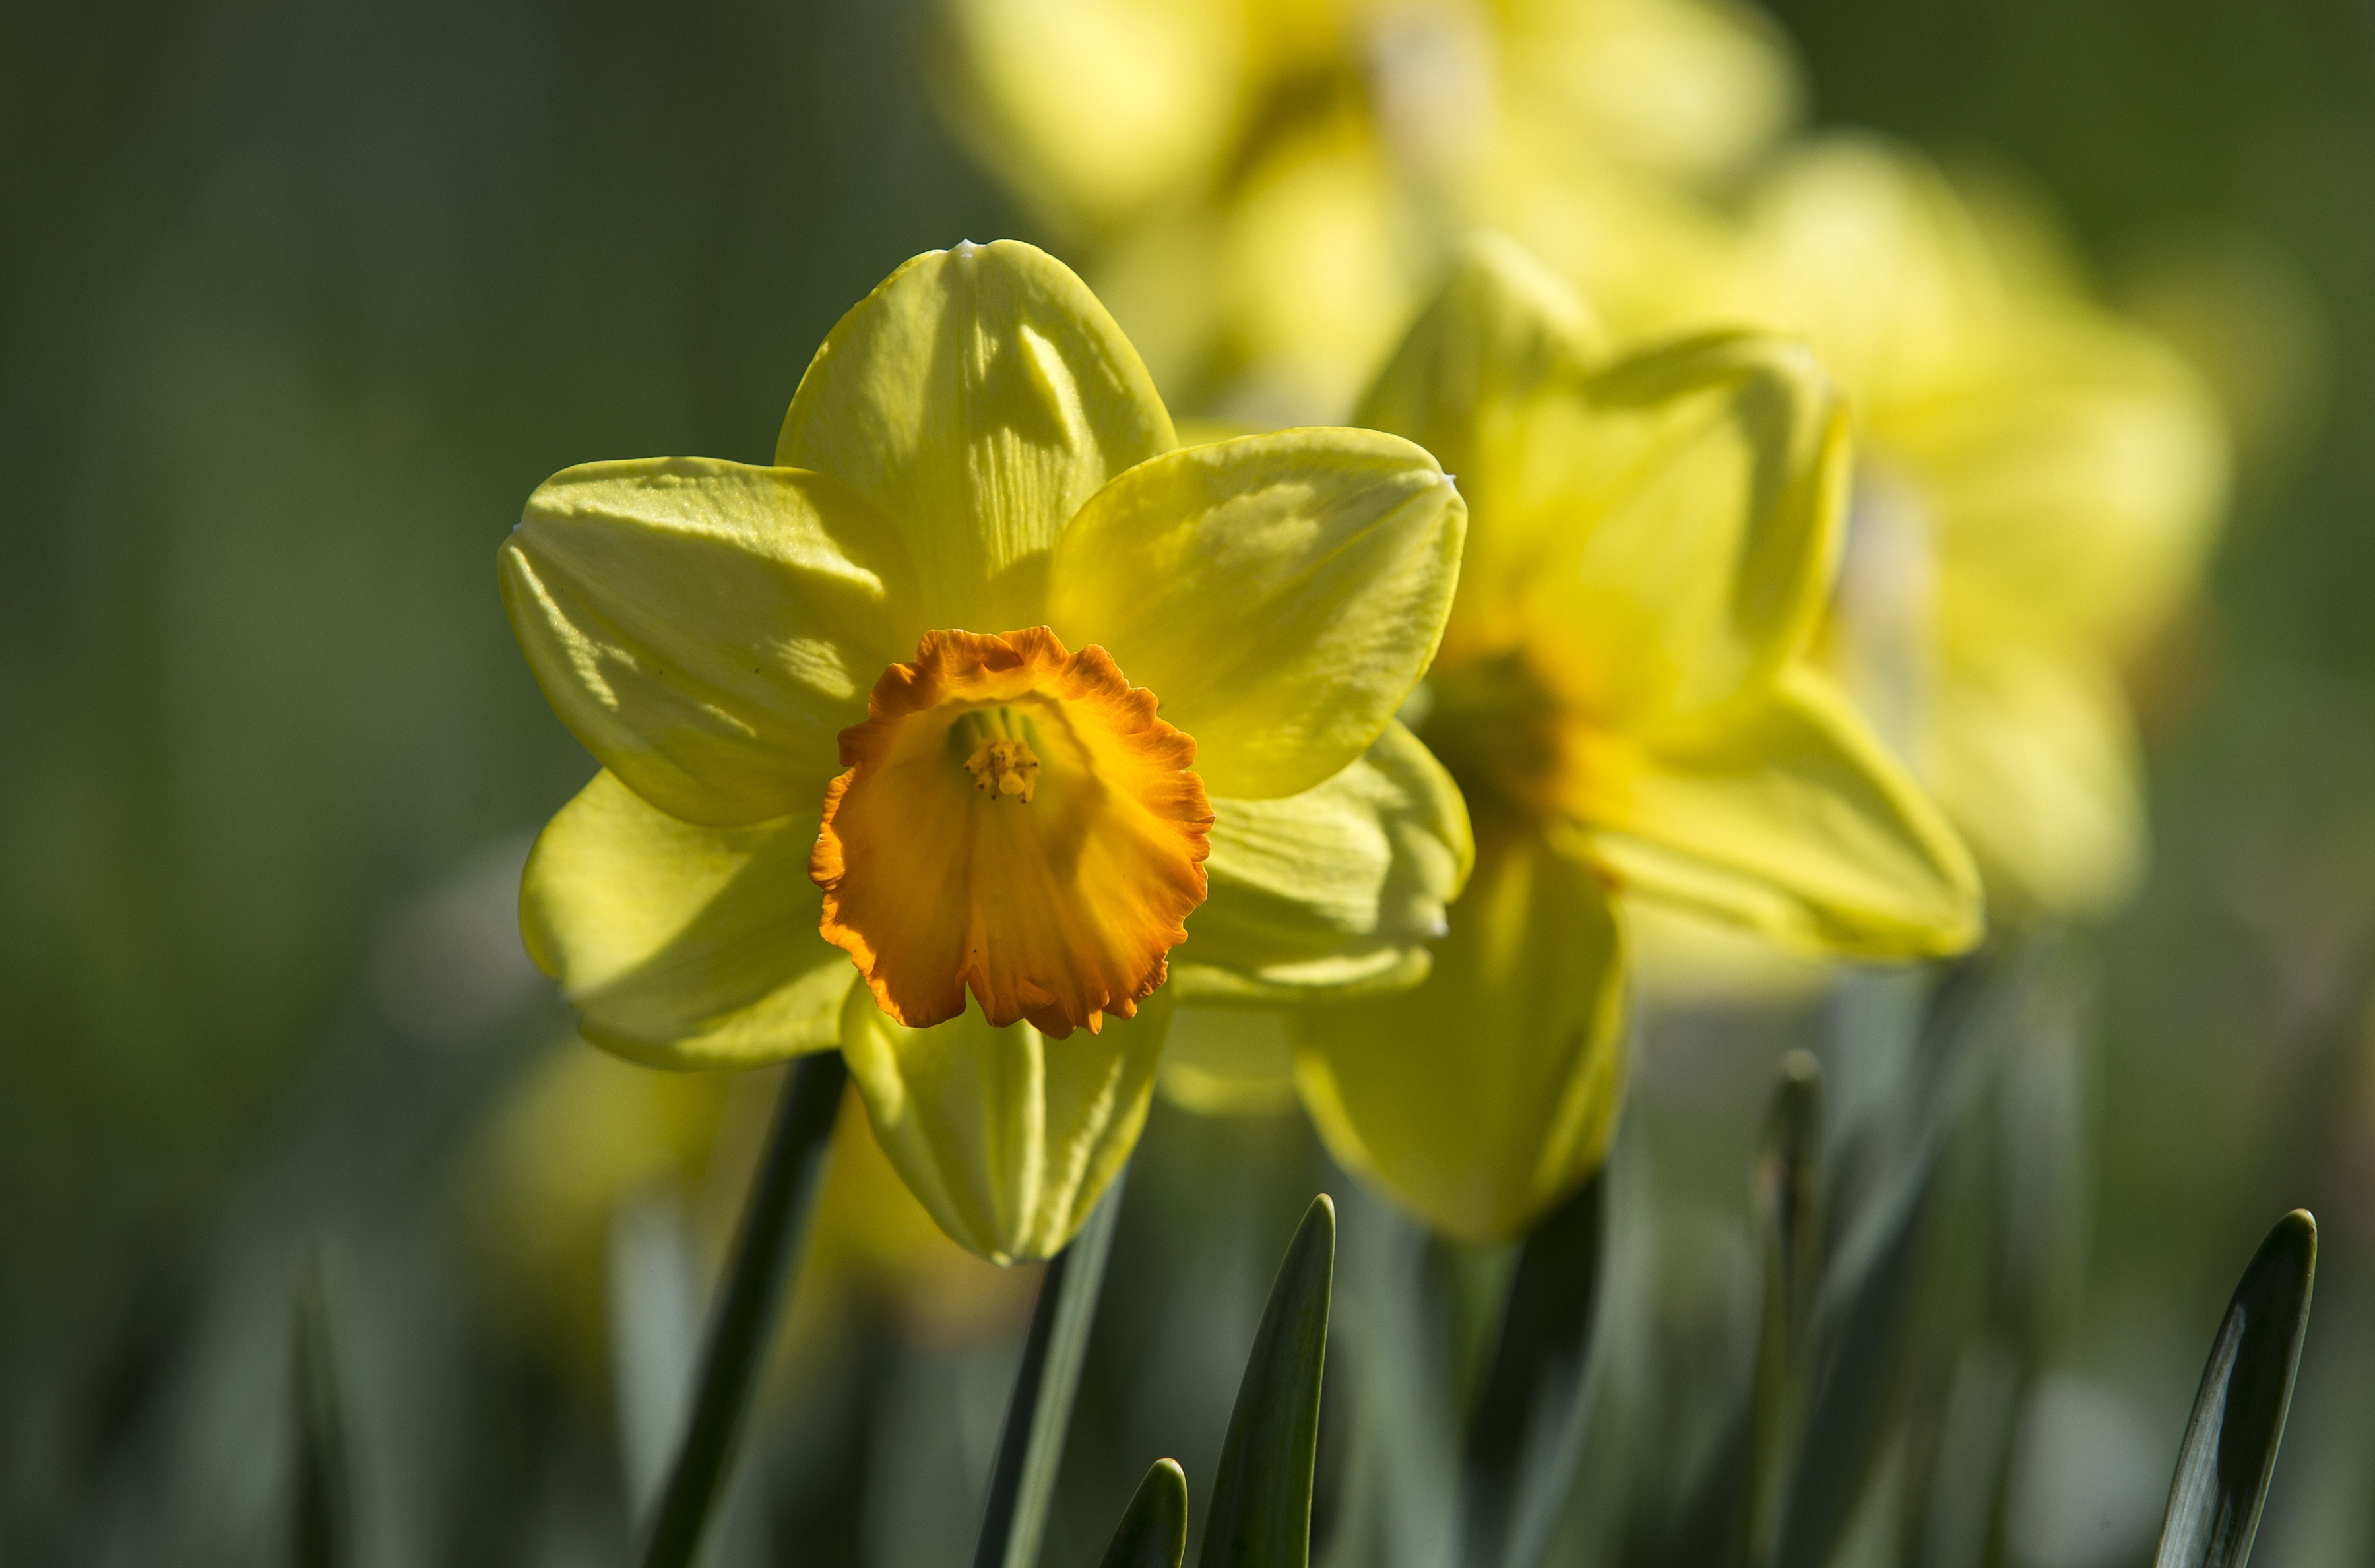 Blüten in tollem Gelb Gartenpflege